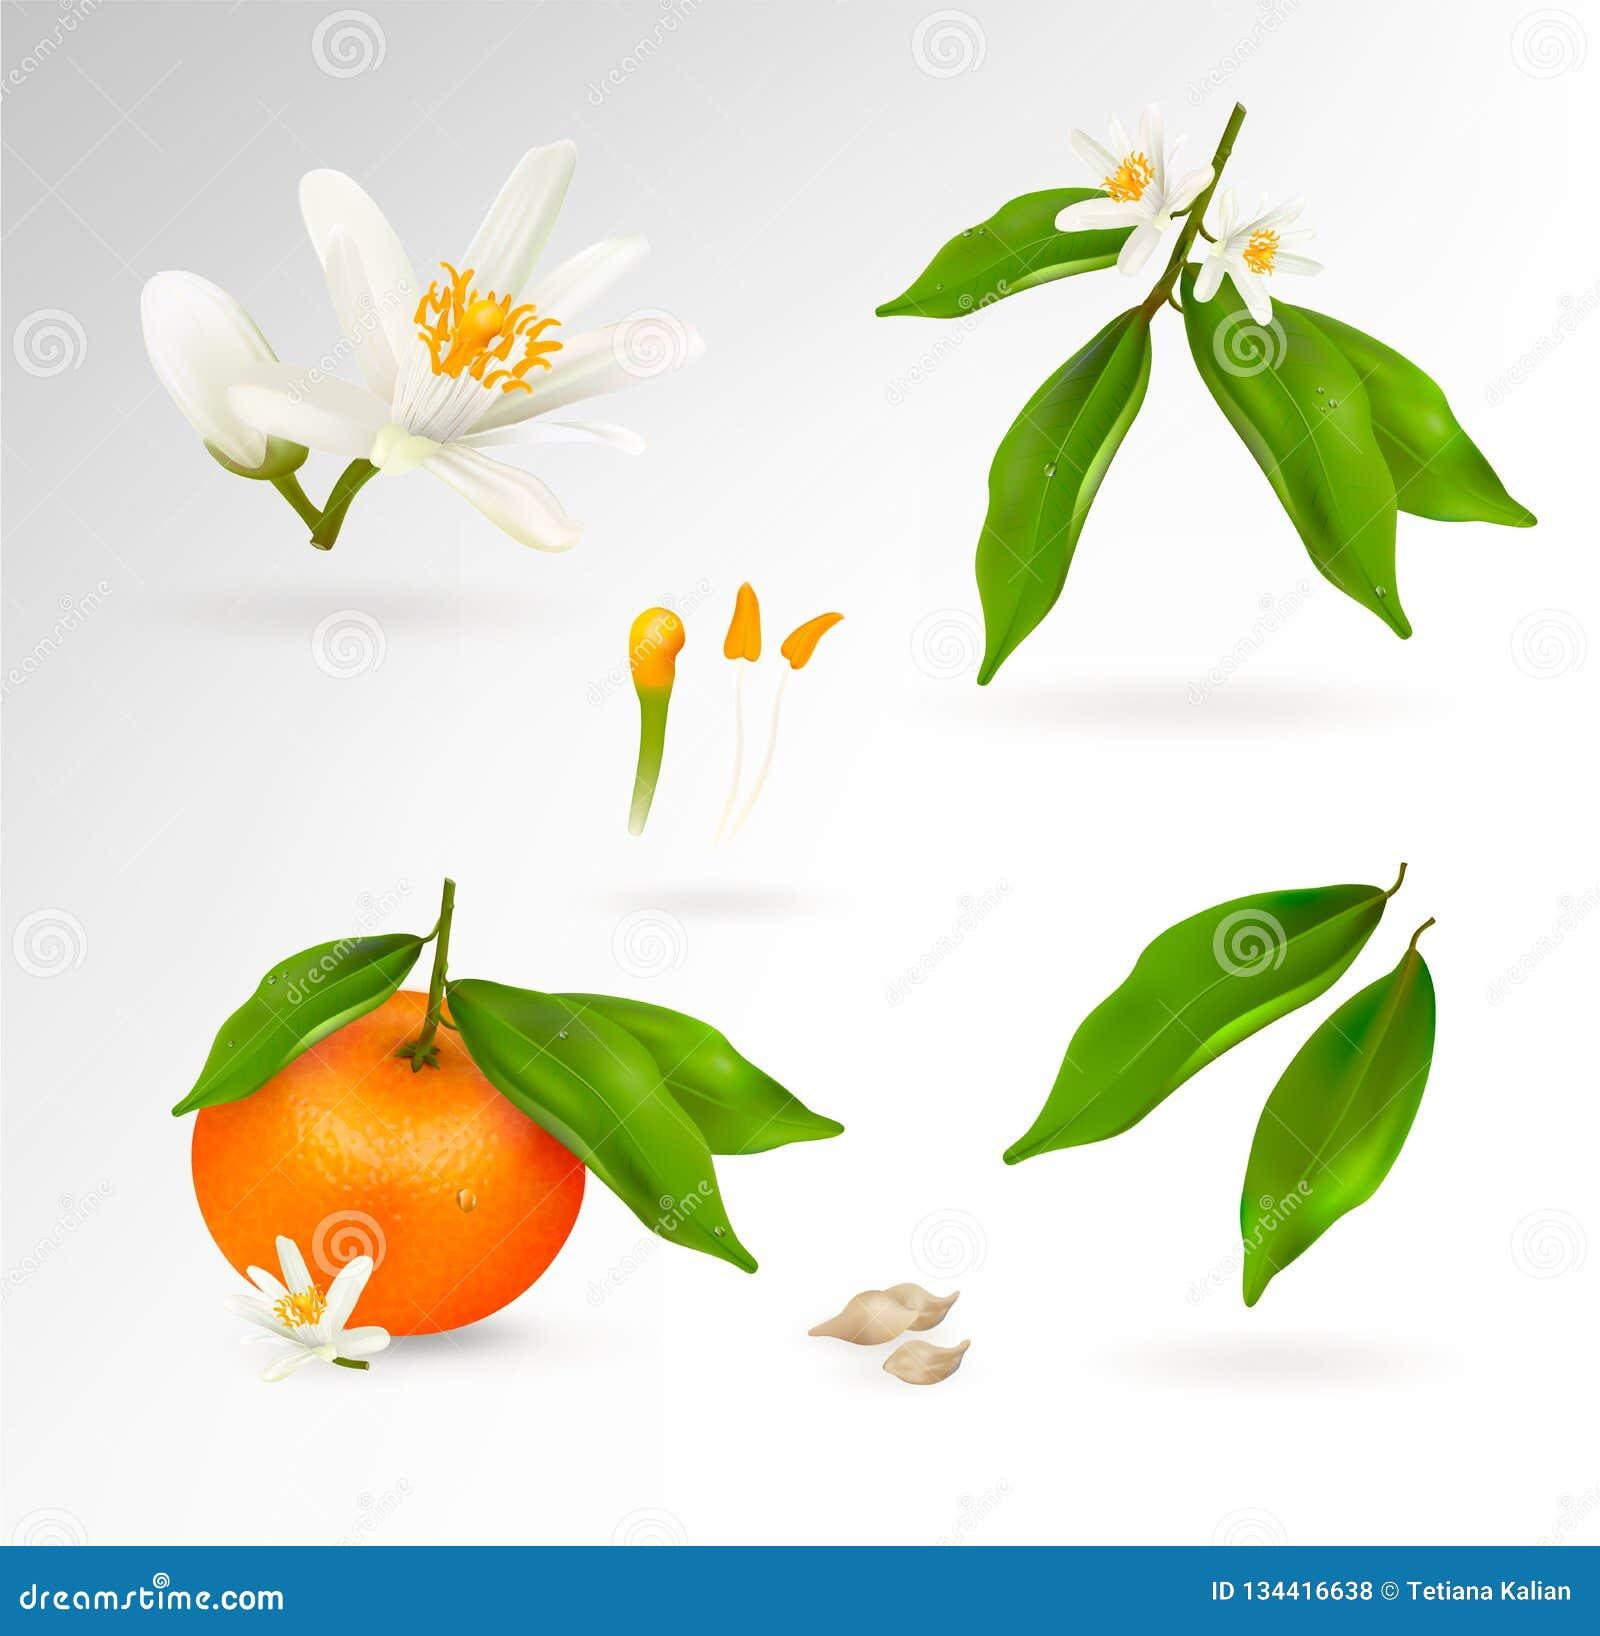 Set of elements of the structure of a mandarin or tangerine citrus plant. Flower, fruit, leaves, twig, stamens, pistil